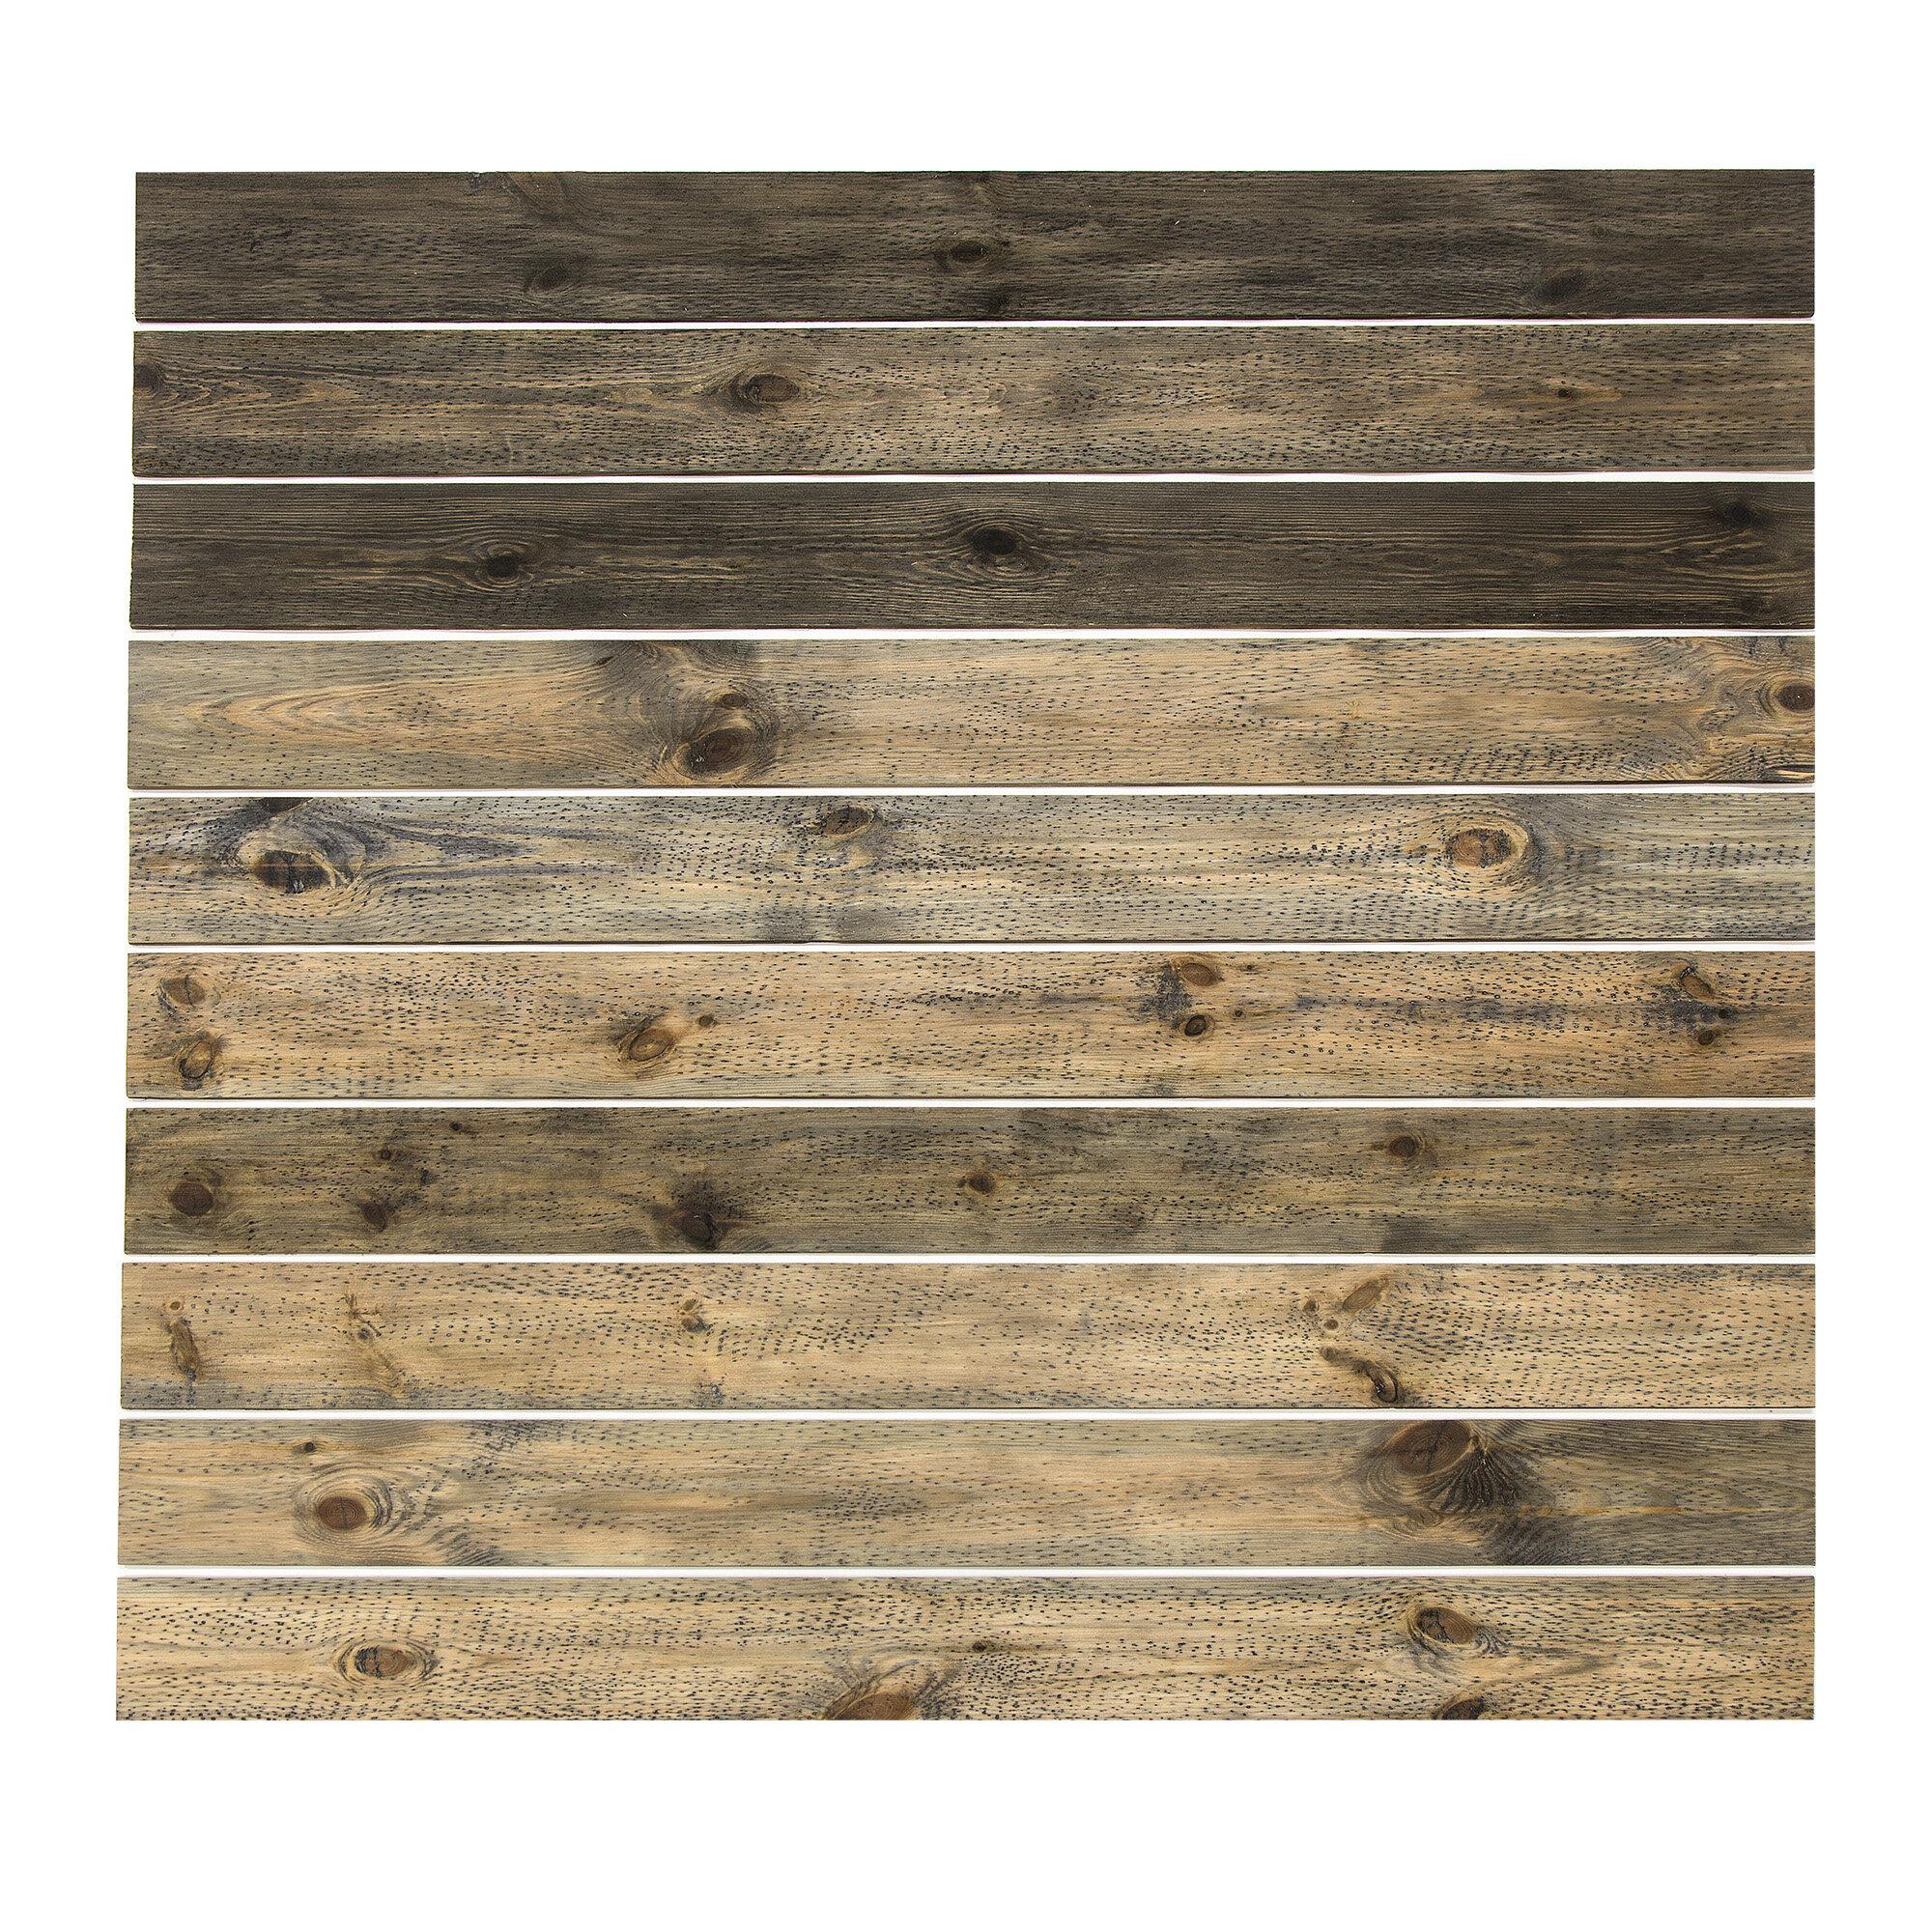 Rusticgrove 4 5 X 45 Reclaimed Solid Wood Wall Paneling Reviews Wayfair